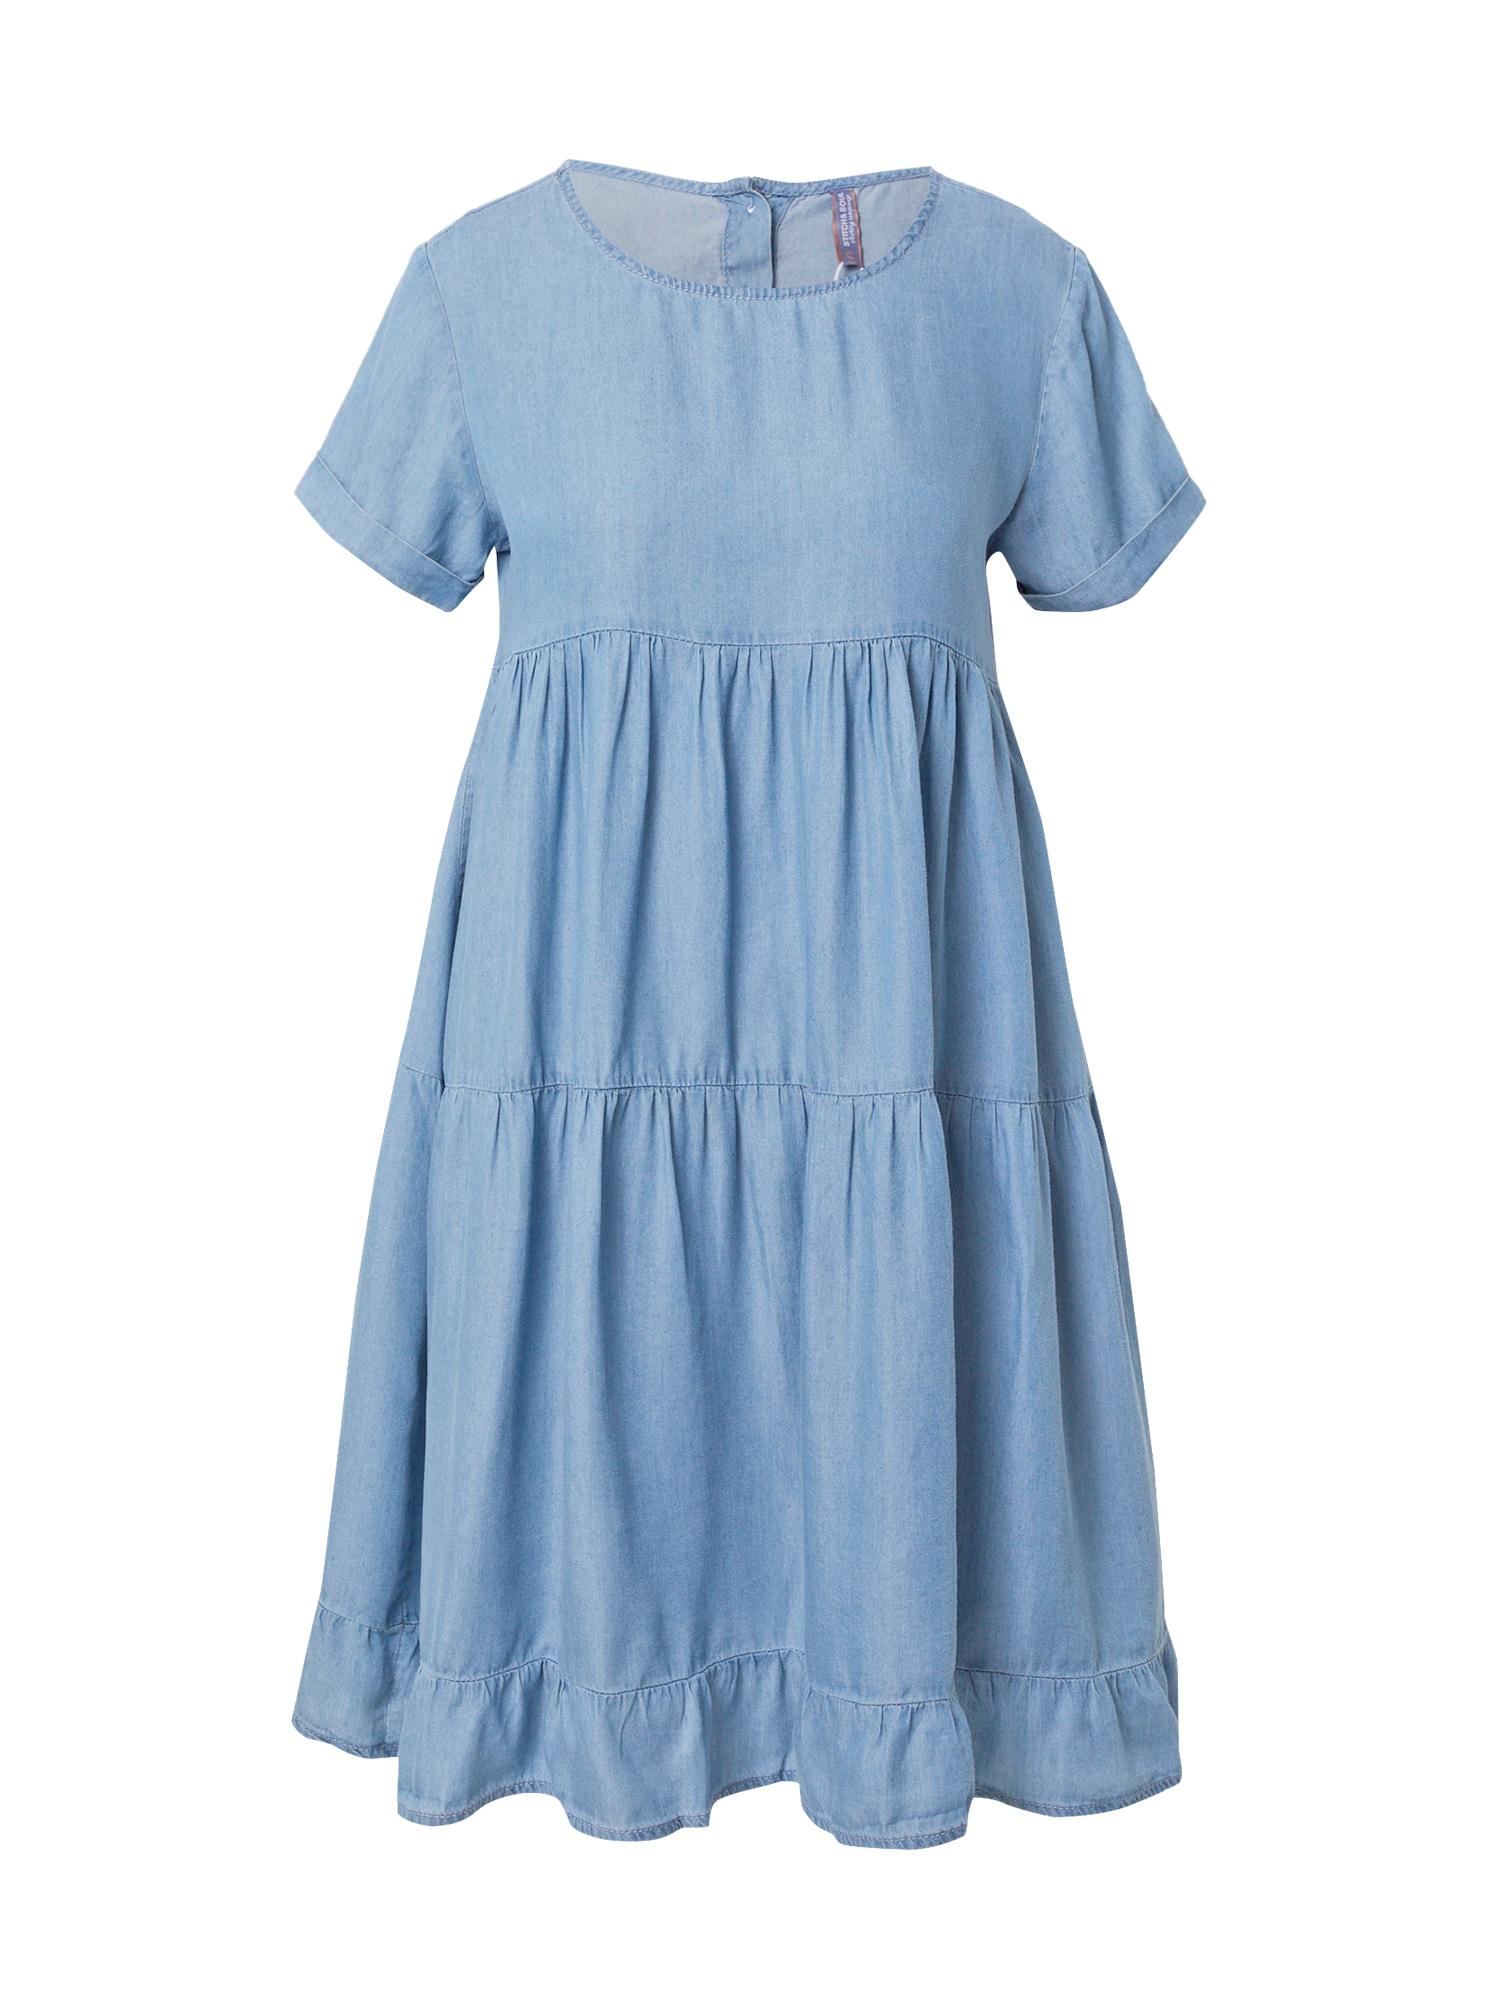 Stitch and Soul Suknelė tamsiai (džinso) mėlyna